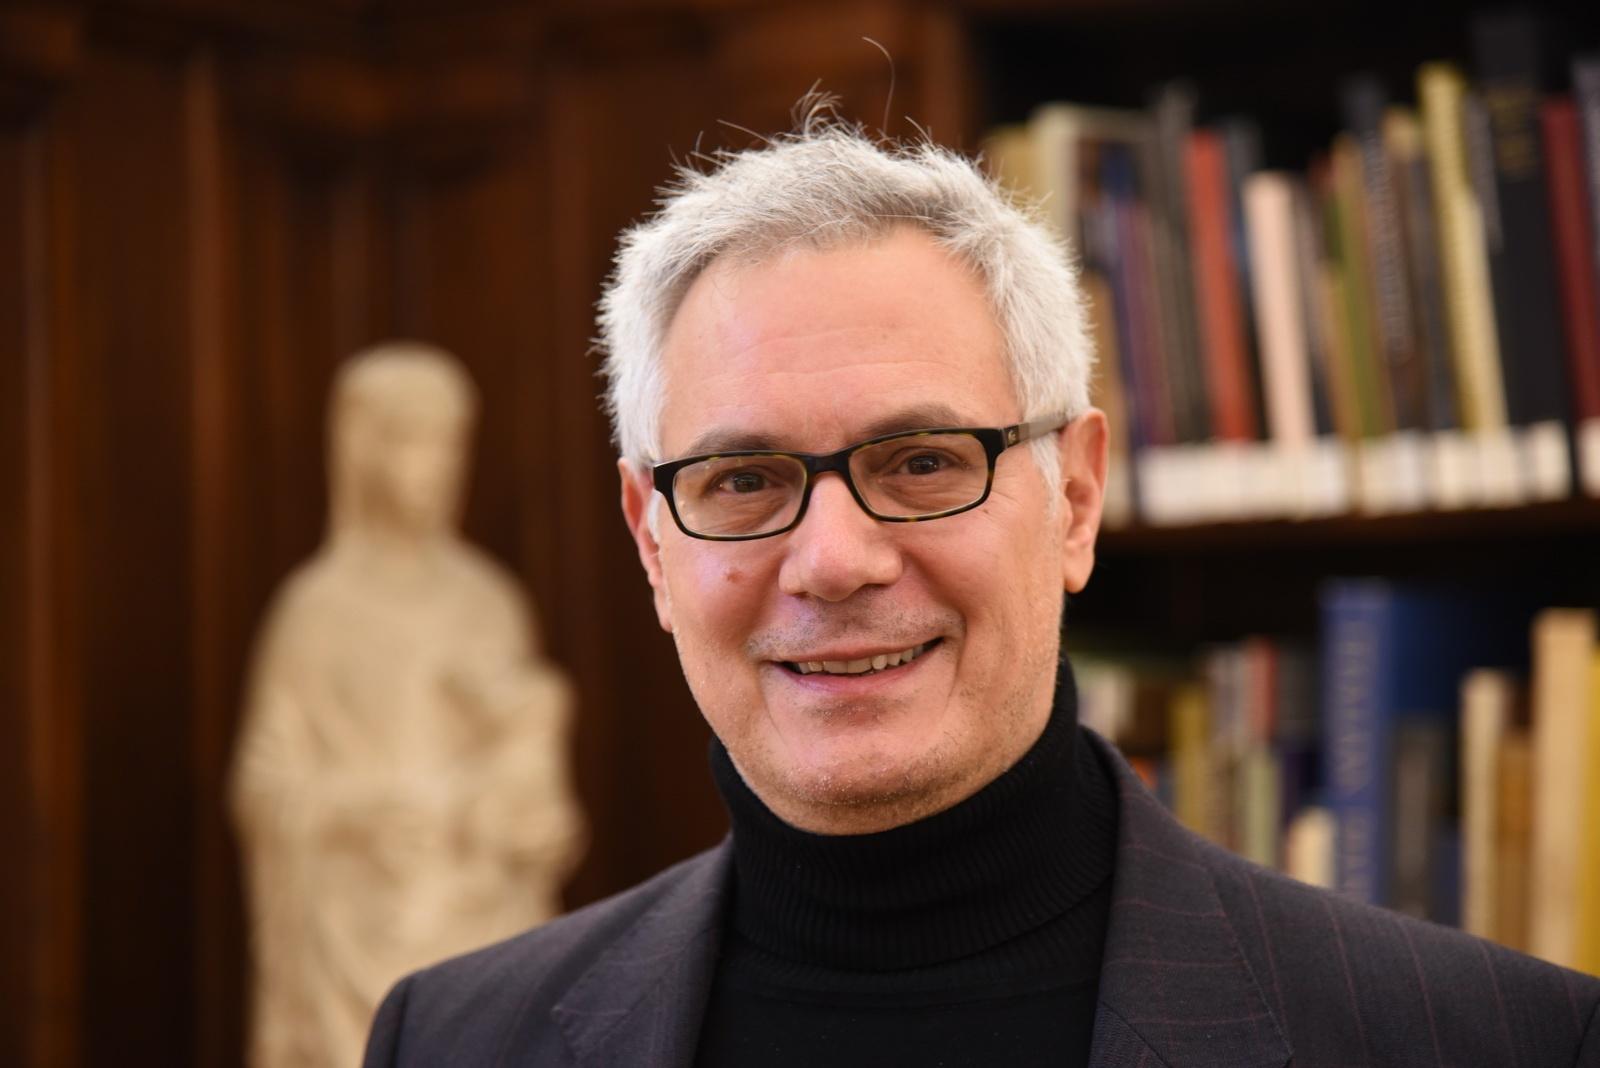 Stefano Cracolici